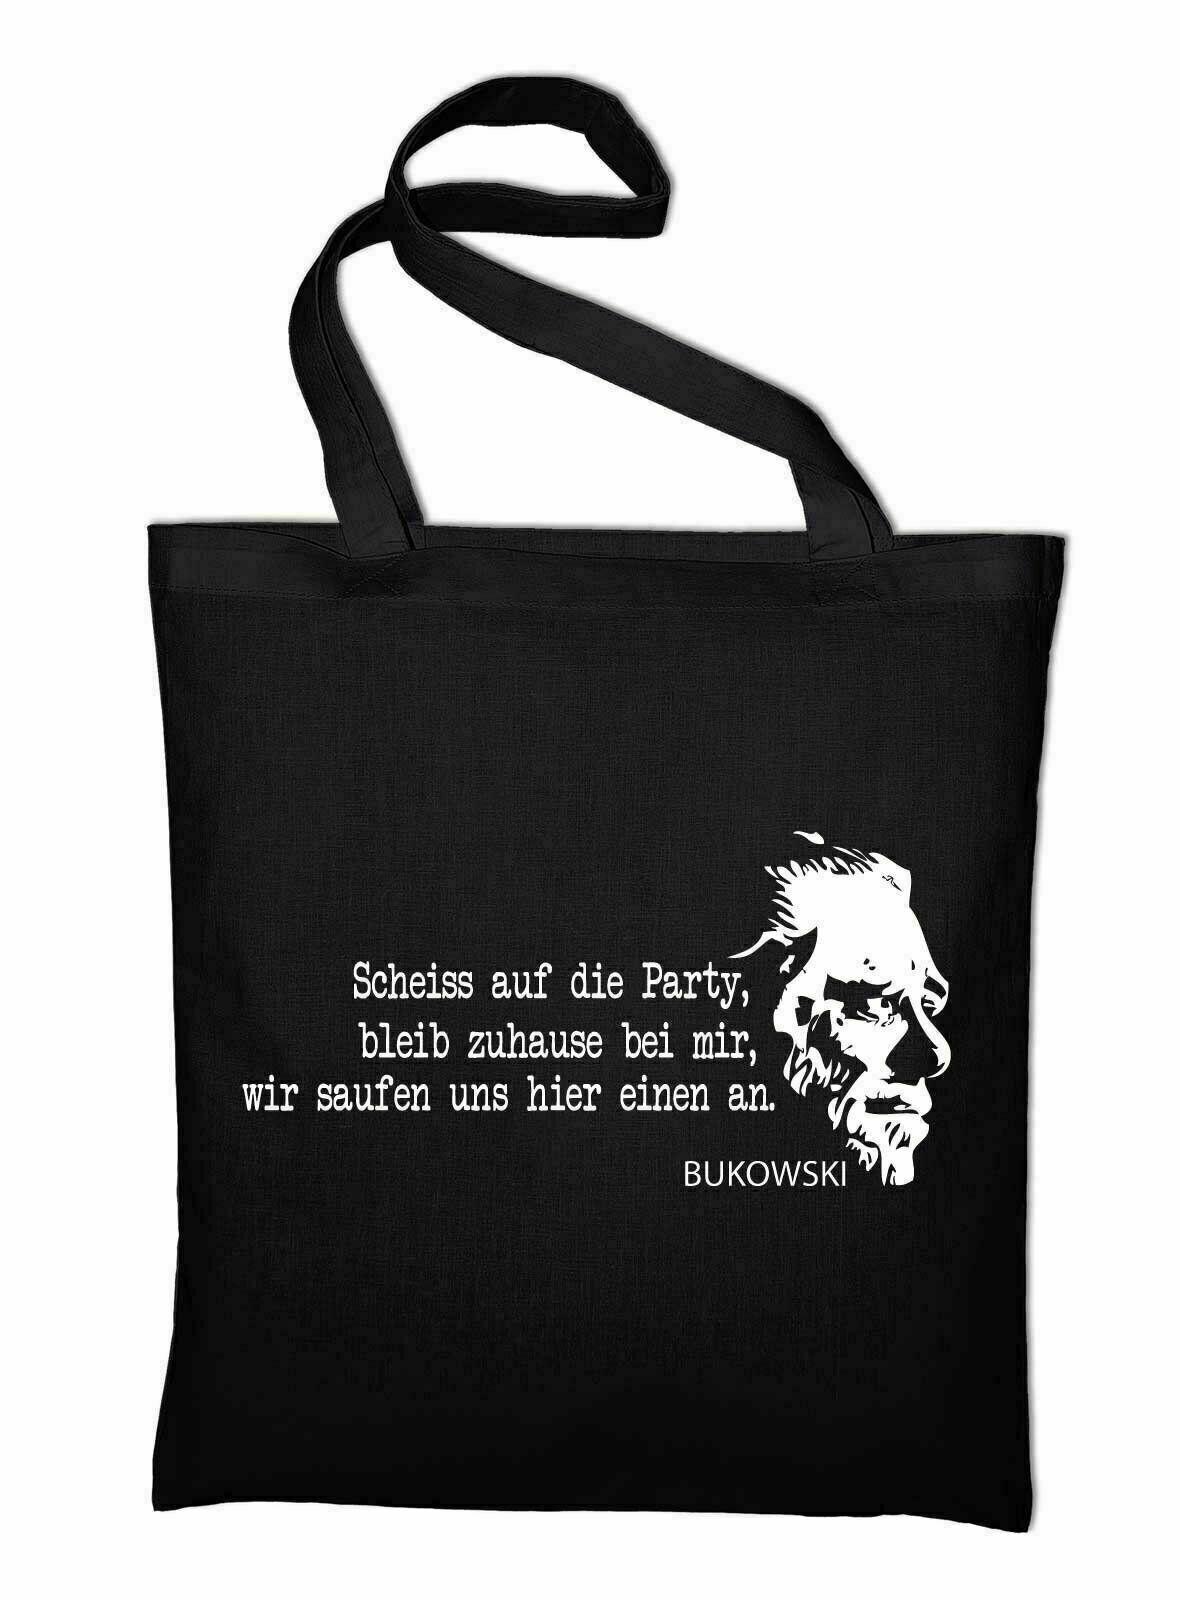 #2 Charles Bukowski Jute Bags BUK Spell Bag Fabric Bag Cotton Pocket Fan